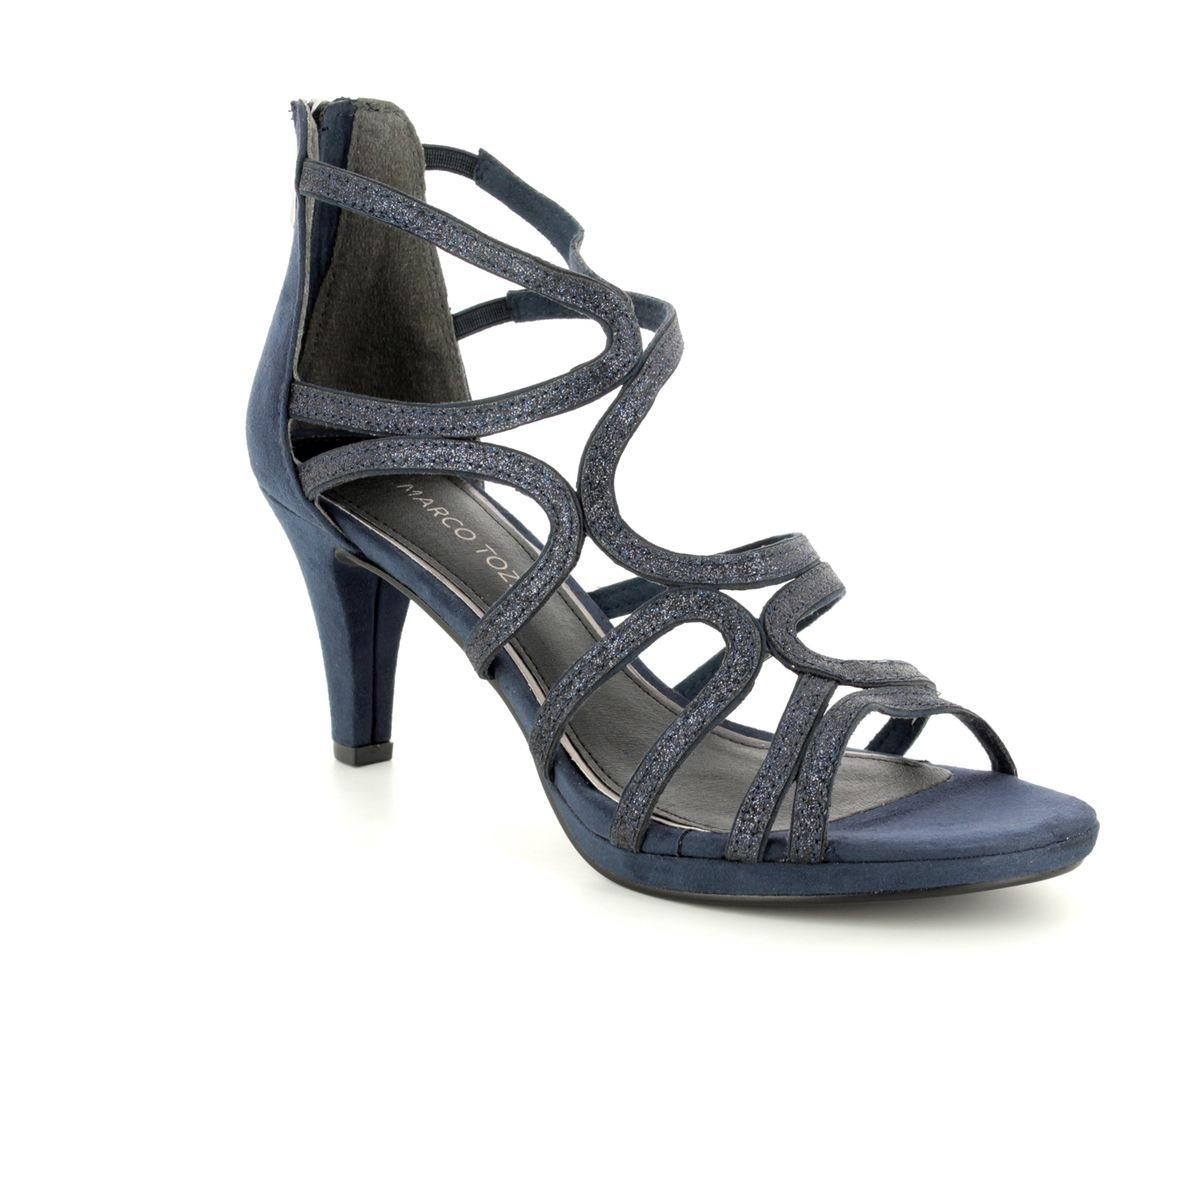 6ff8ca09 Marco Tozzi Heeled Sandals - Navy - 28373/20/890 PADULIA